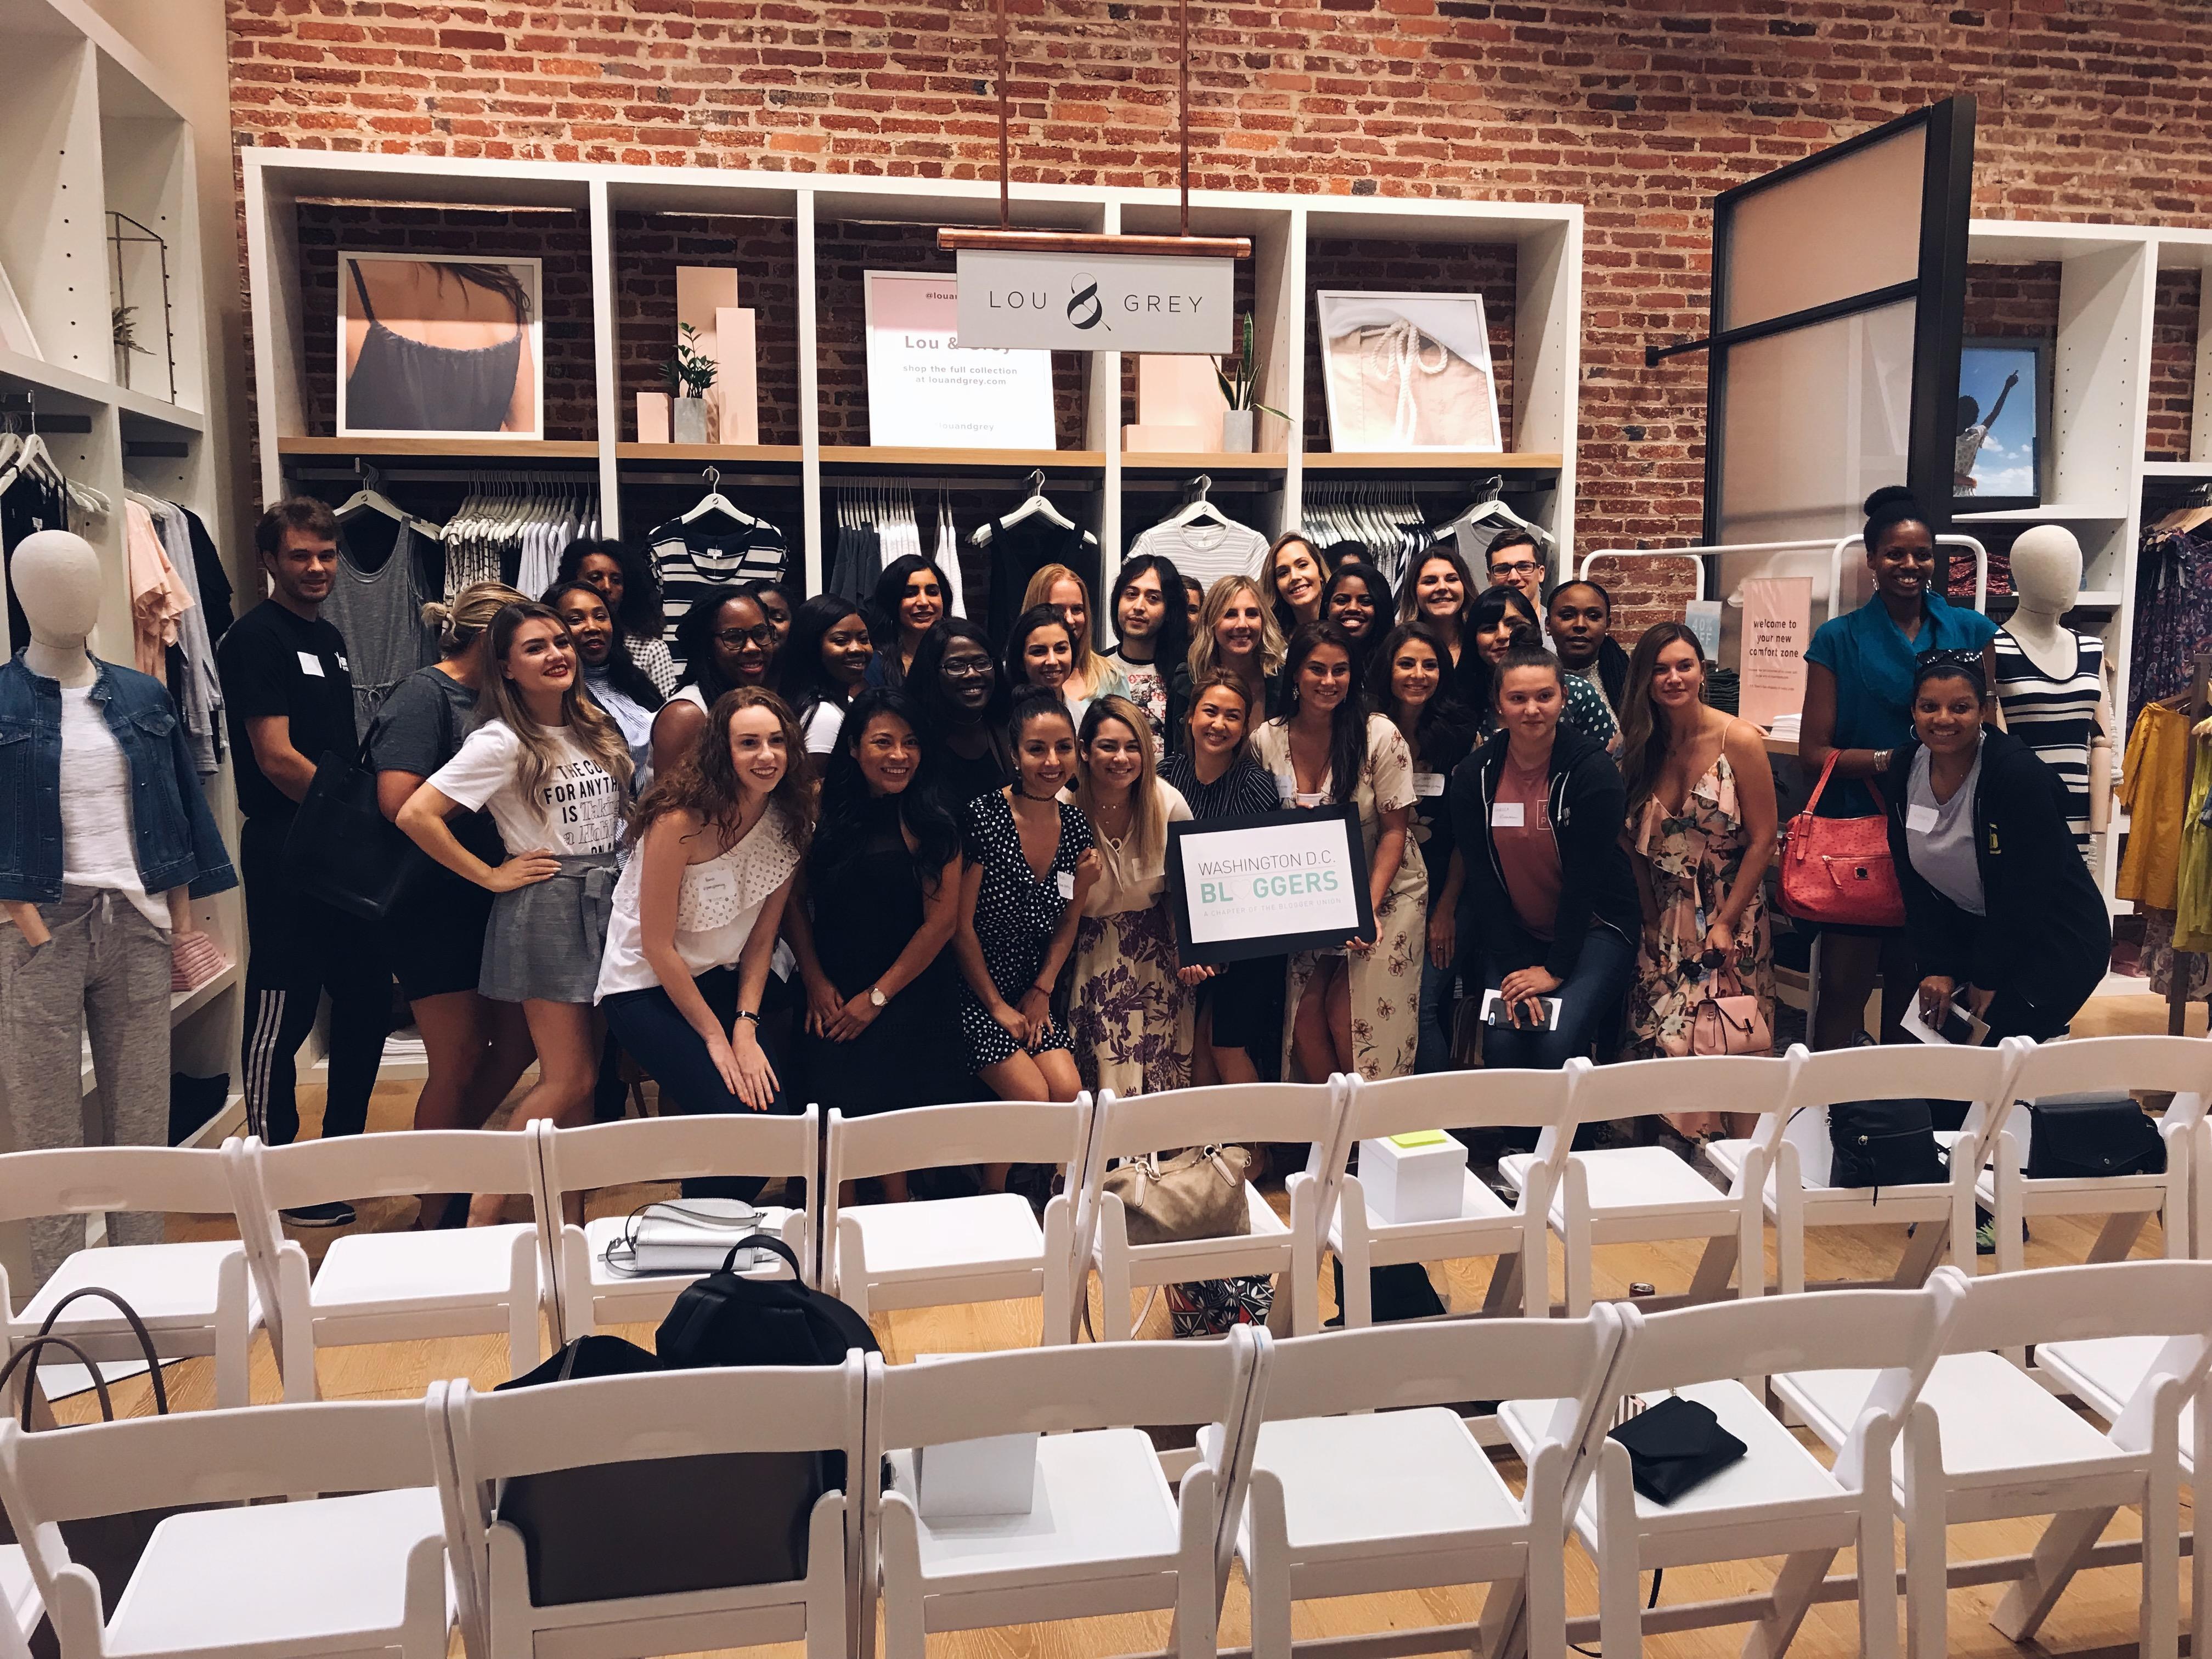 D.C. Bloggers June 2018 Meetup Recap ft. Meg Biram